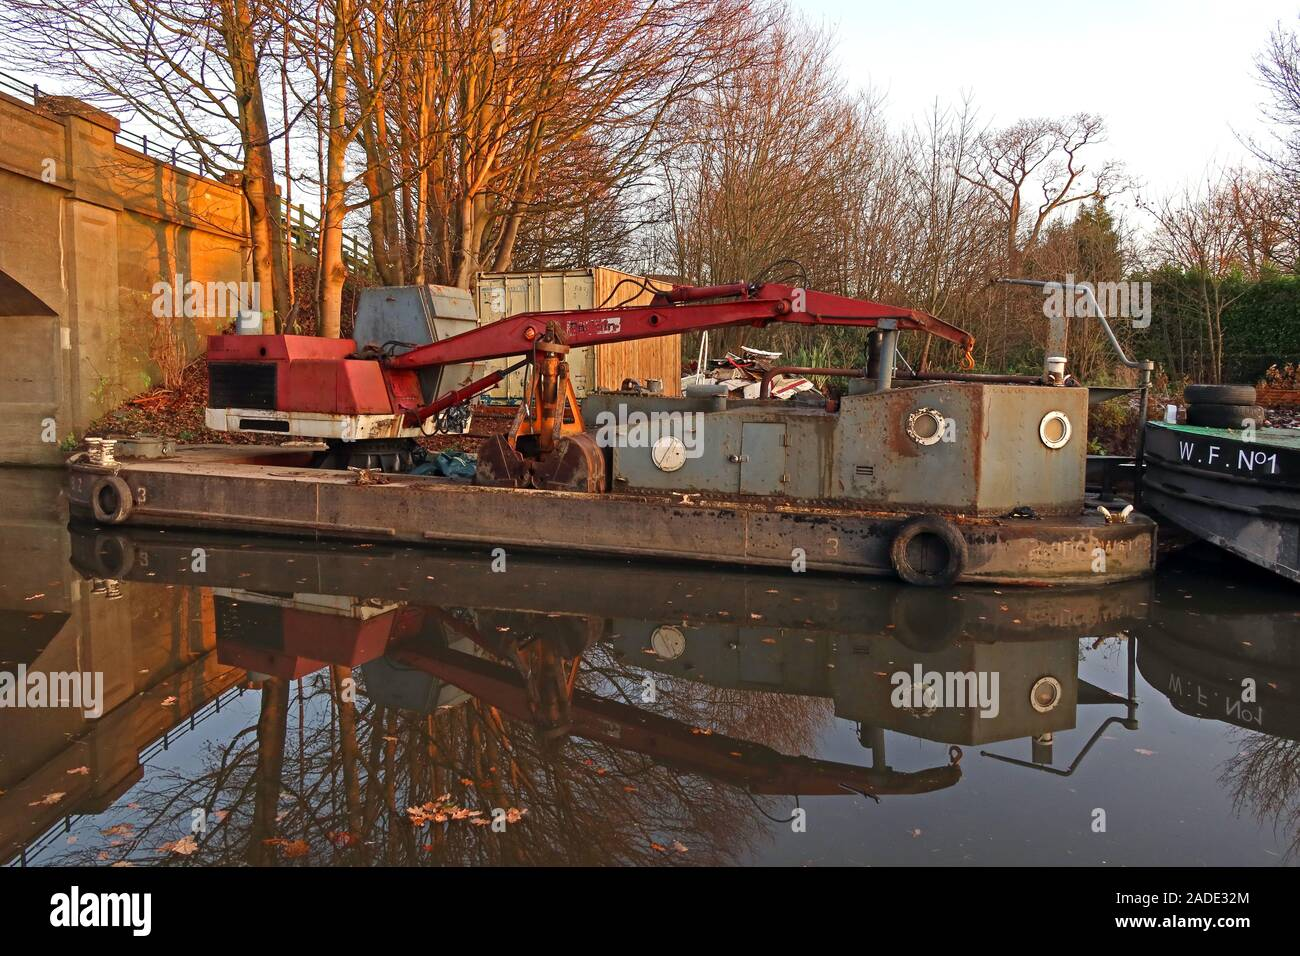 Water Witch,Working Barge,Bridgewater Canal, Lymm,Warrington,Cheshire,Inglaterra,Reino Unido,WA4 Foto de stock